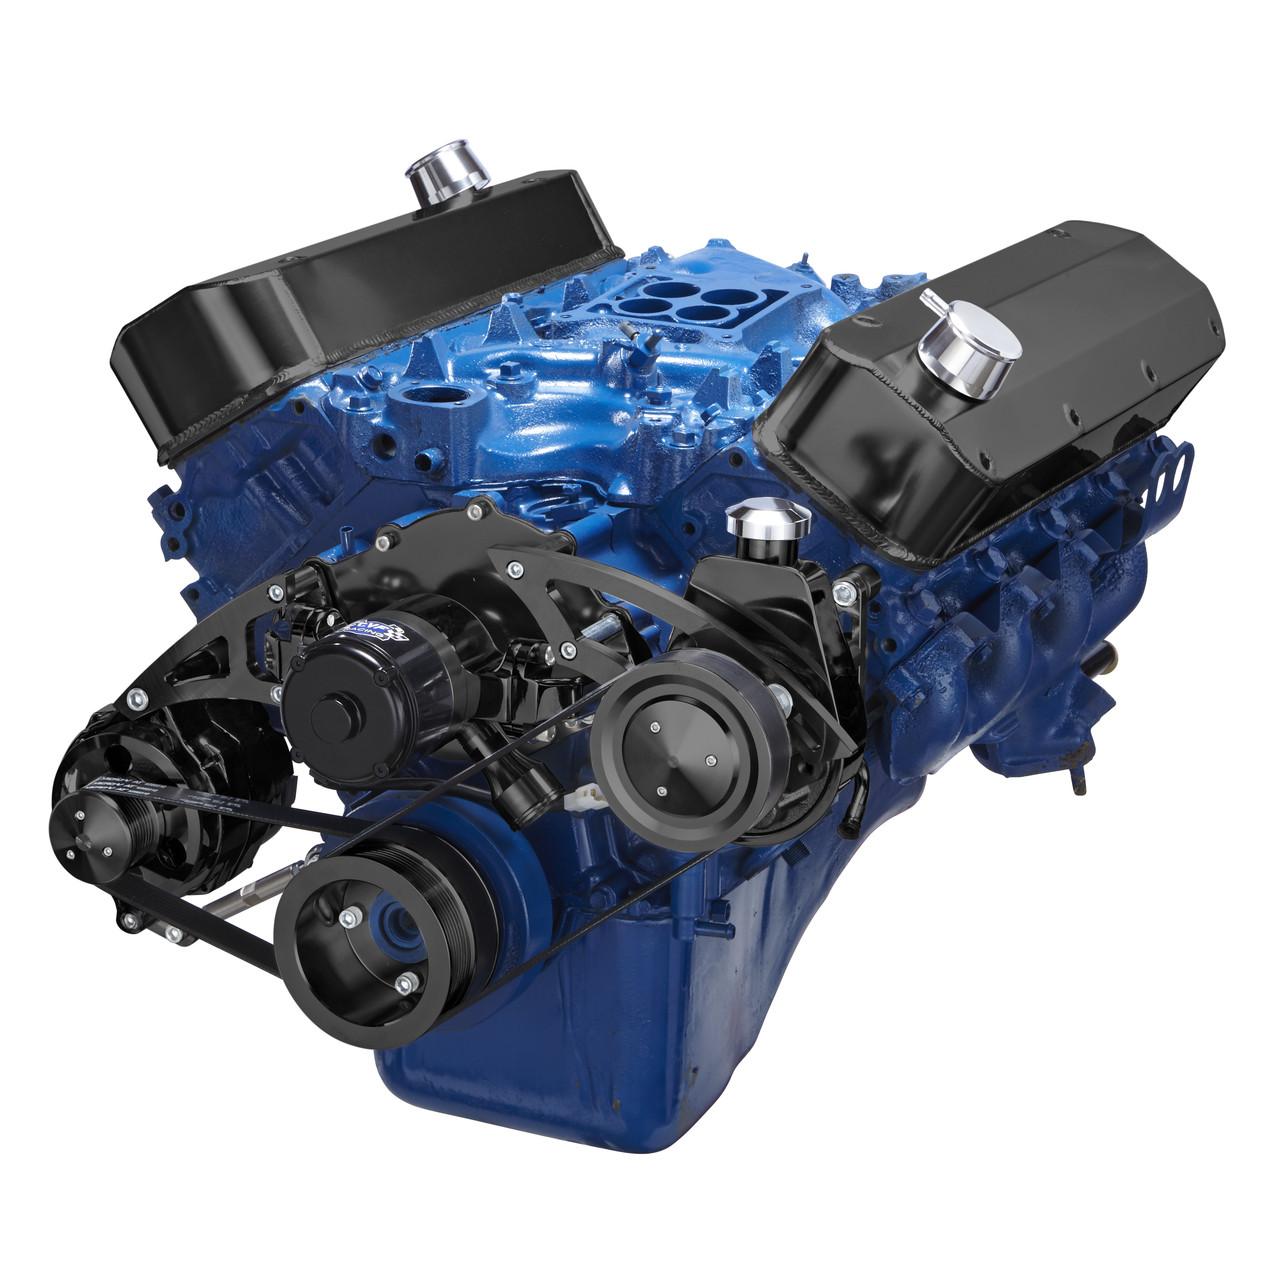 black ford 429 460 big block serpentine conversion kit electric water pump and saginaw power steering [ 1280 x 1280 Pixel ]